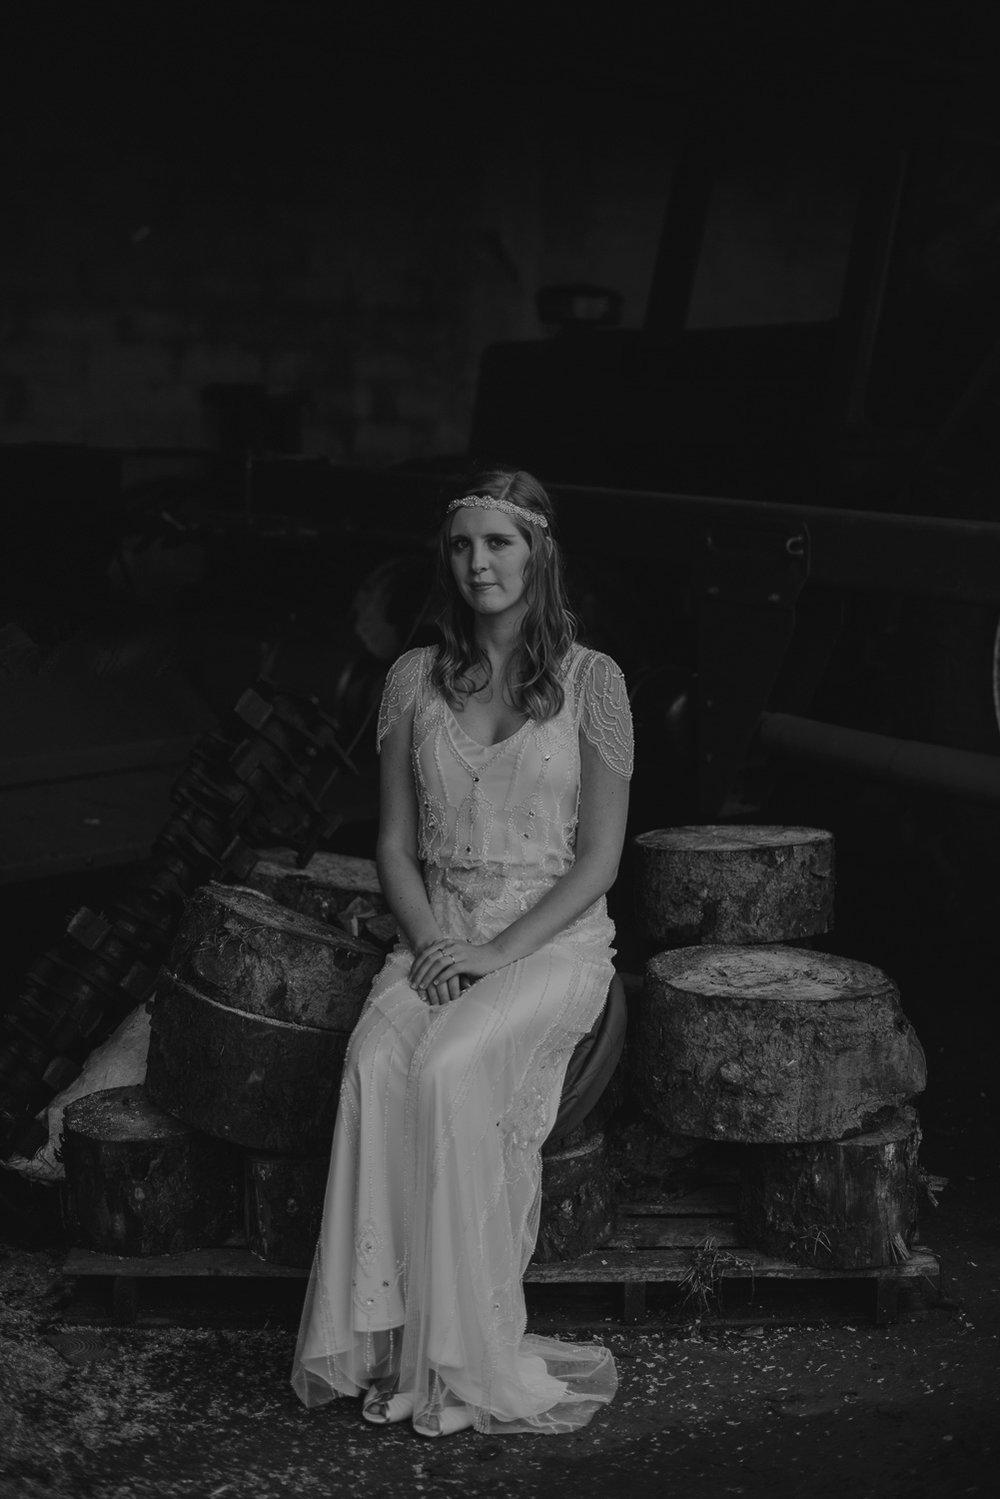 northern-ireland-wedding-photographer-esther-irvine-125.jpg